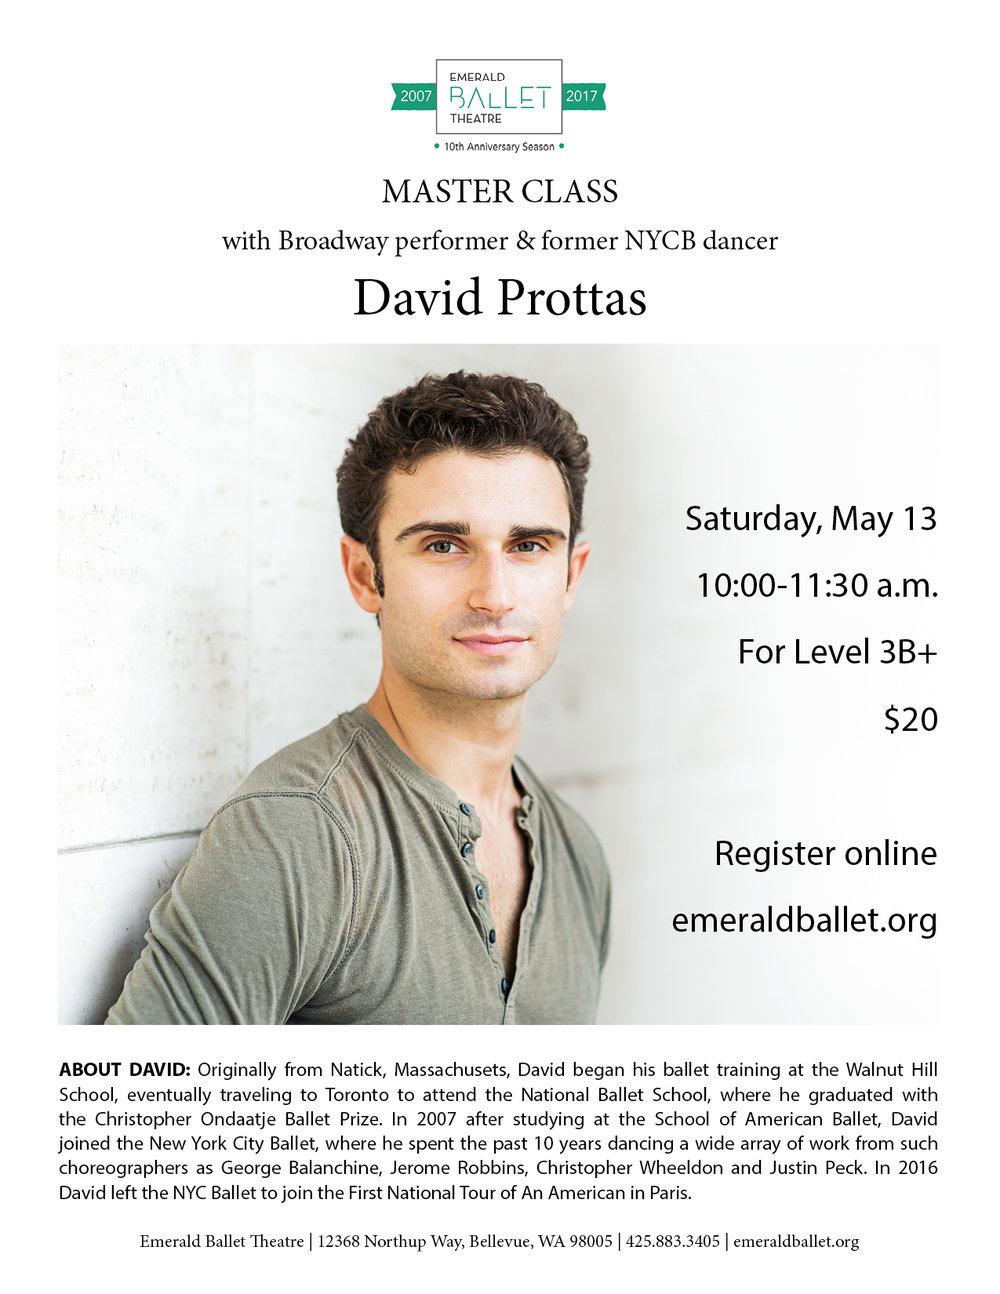 Prottas-MasterClass.jpg